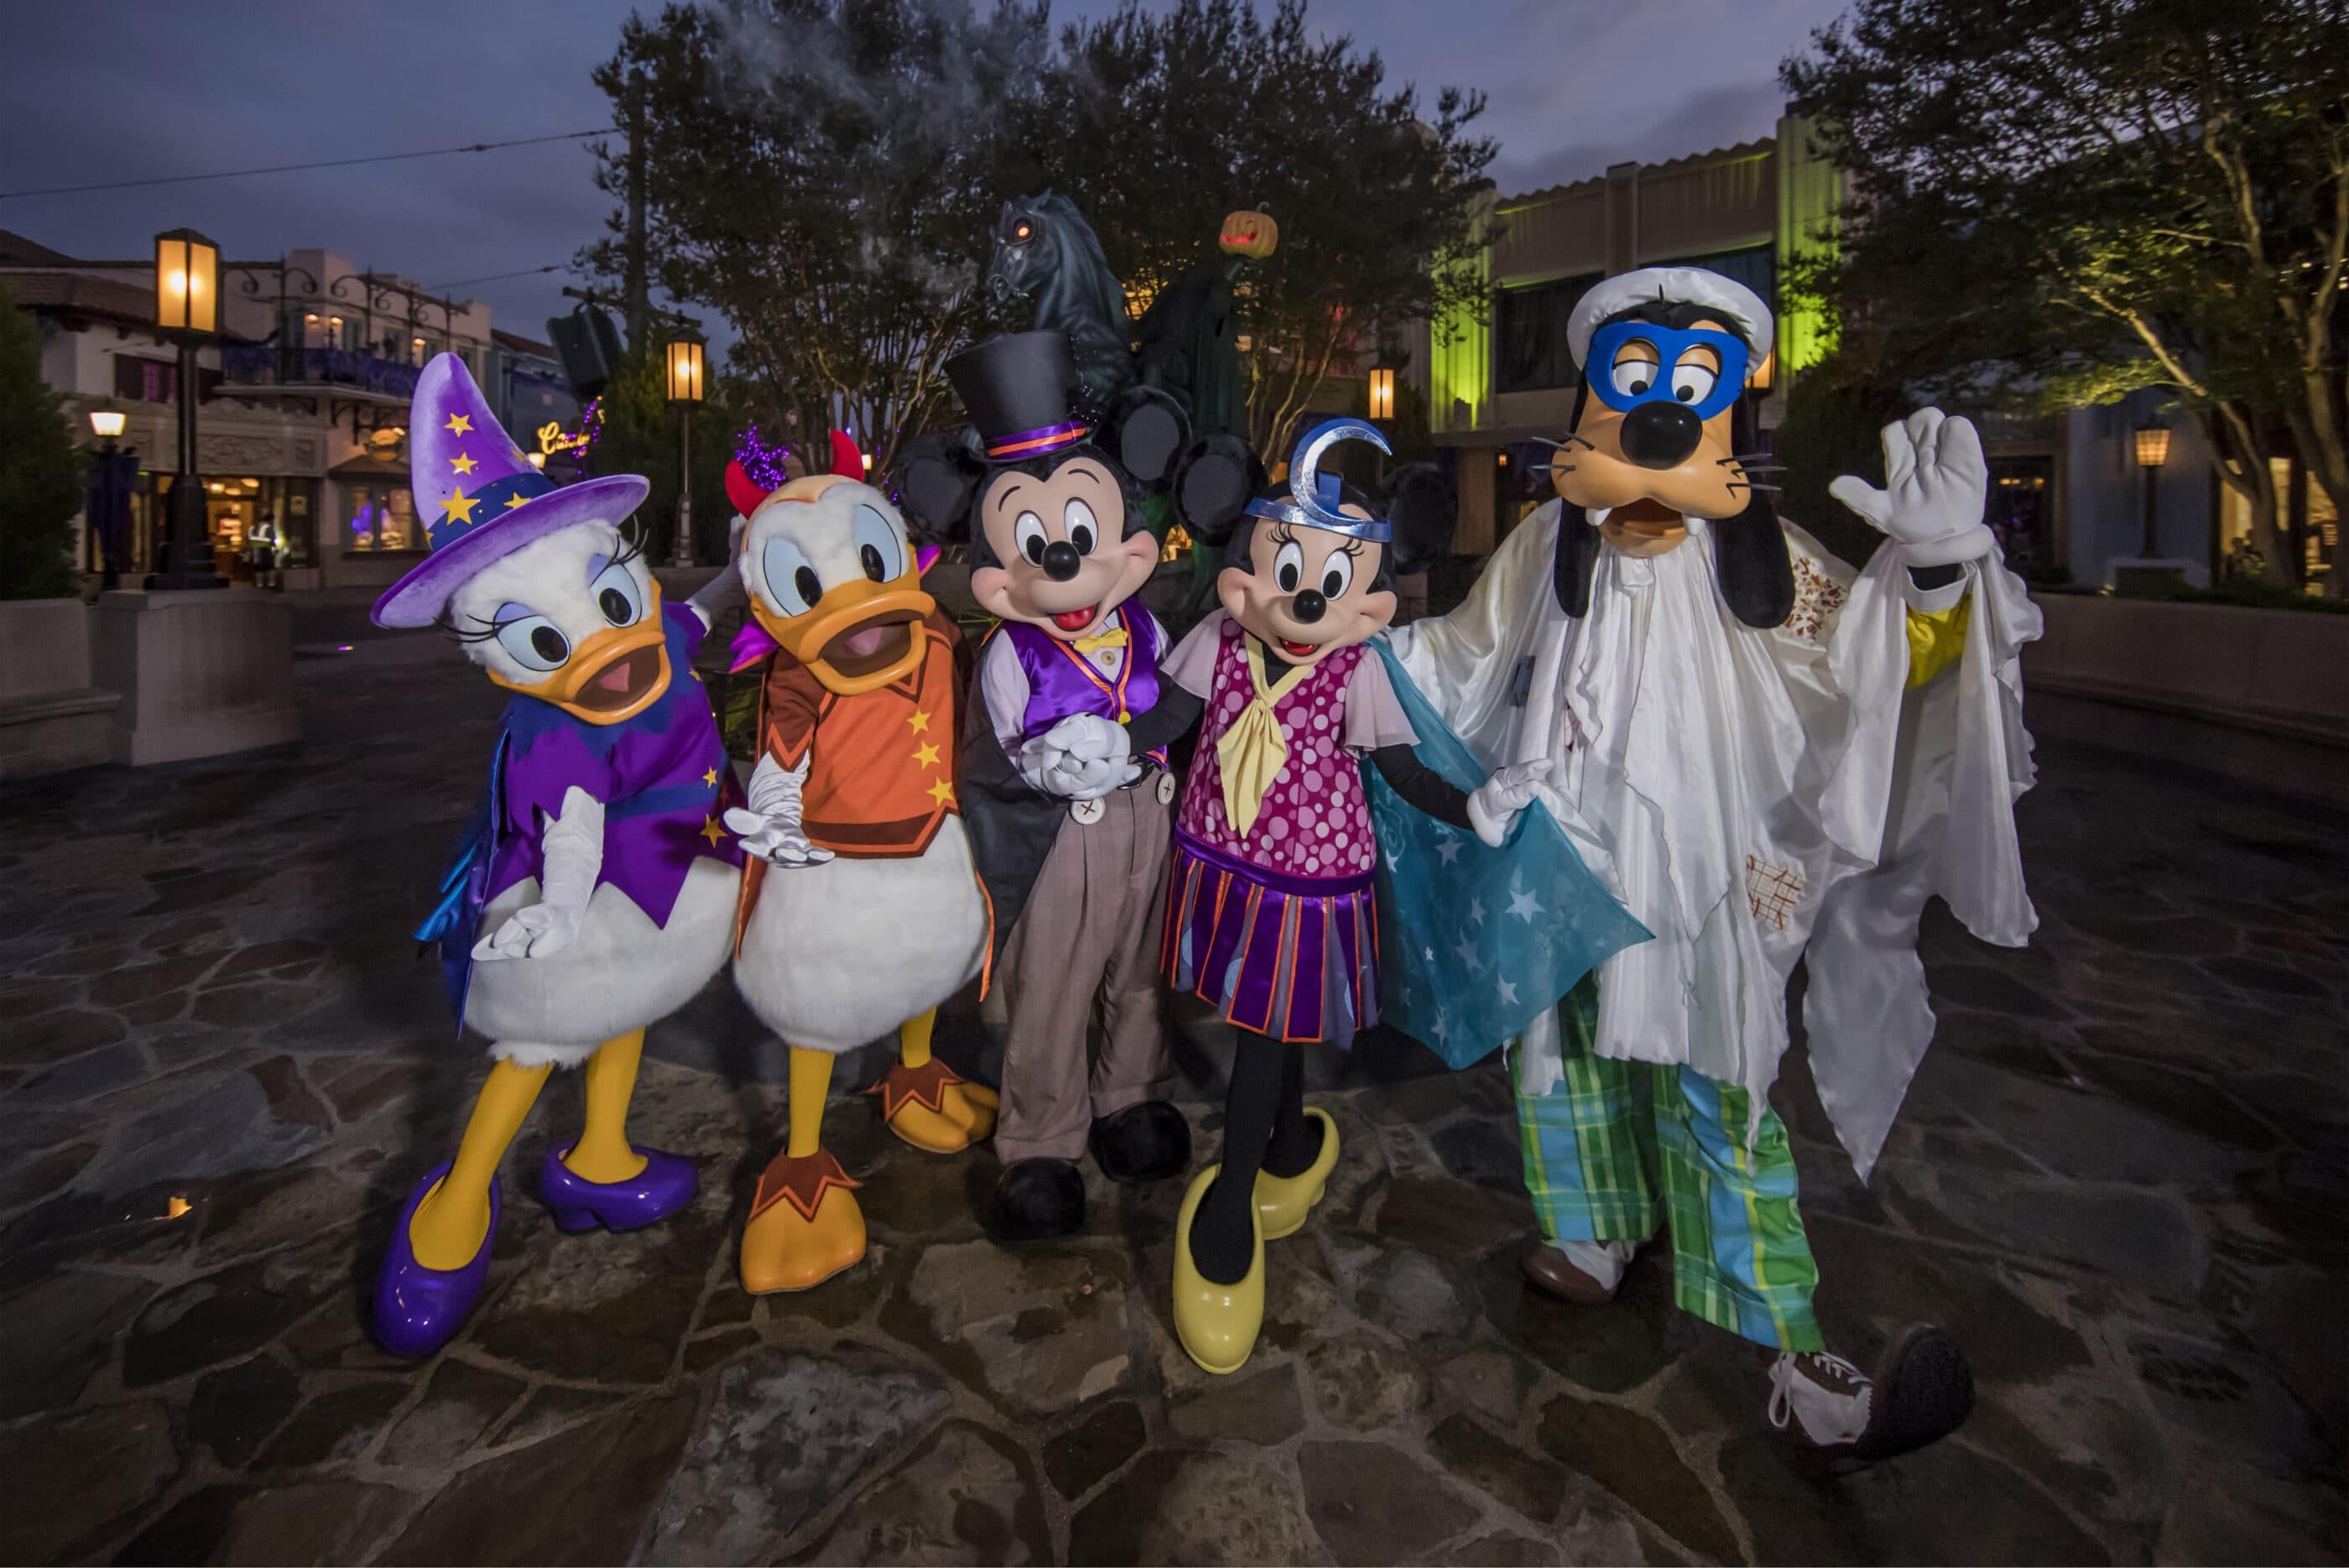 Favorite Disney characters dressed up in Halloween costumes.